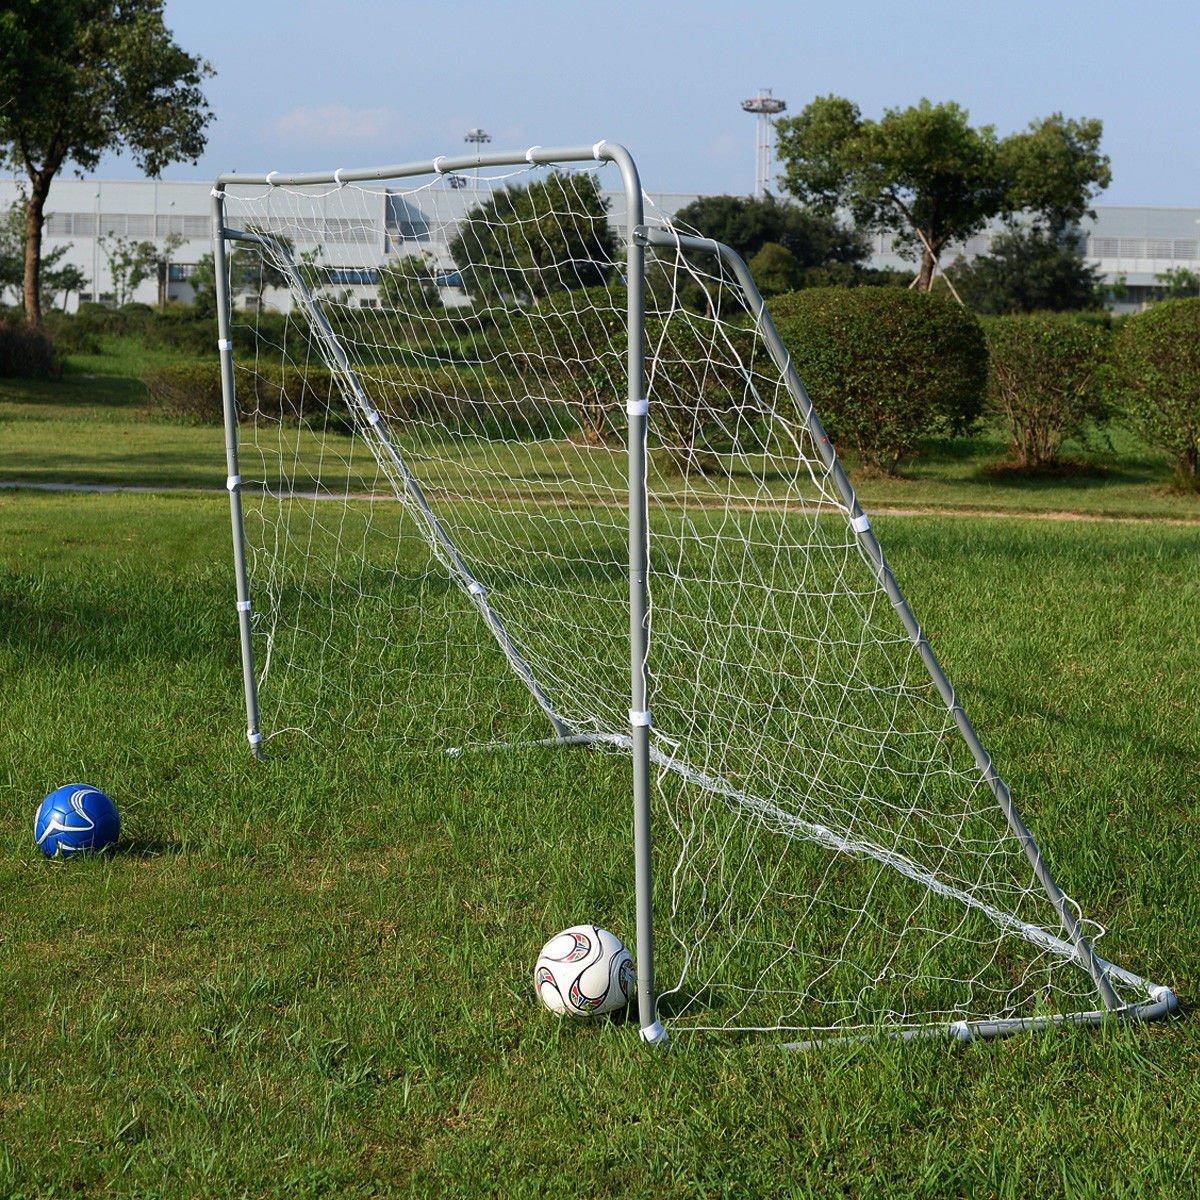 Giantex 12 x 6 Ft Soccer Goal w/ Net, Steel Frame and Velcro Straps, Indoor Outdoor Backyard Kids Children Soccer Goal by Giantex (Image #3)